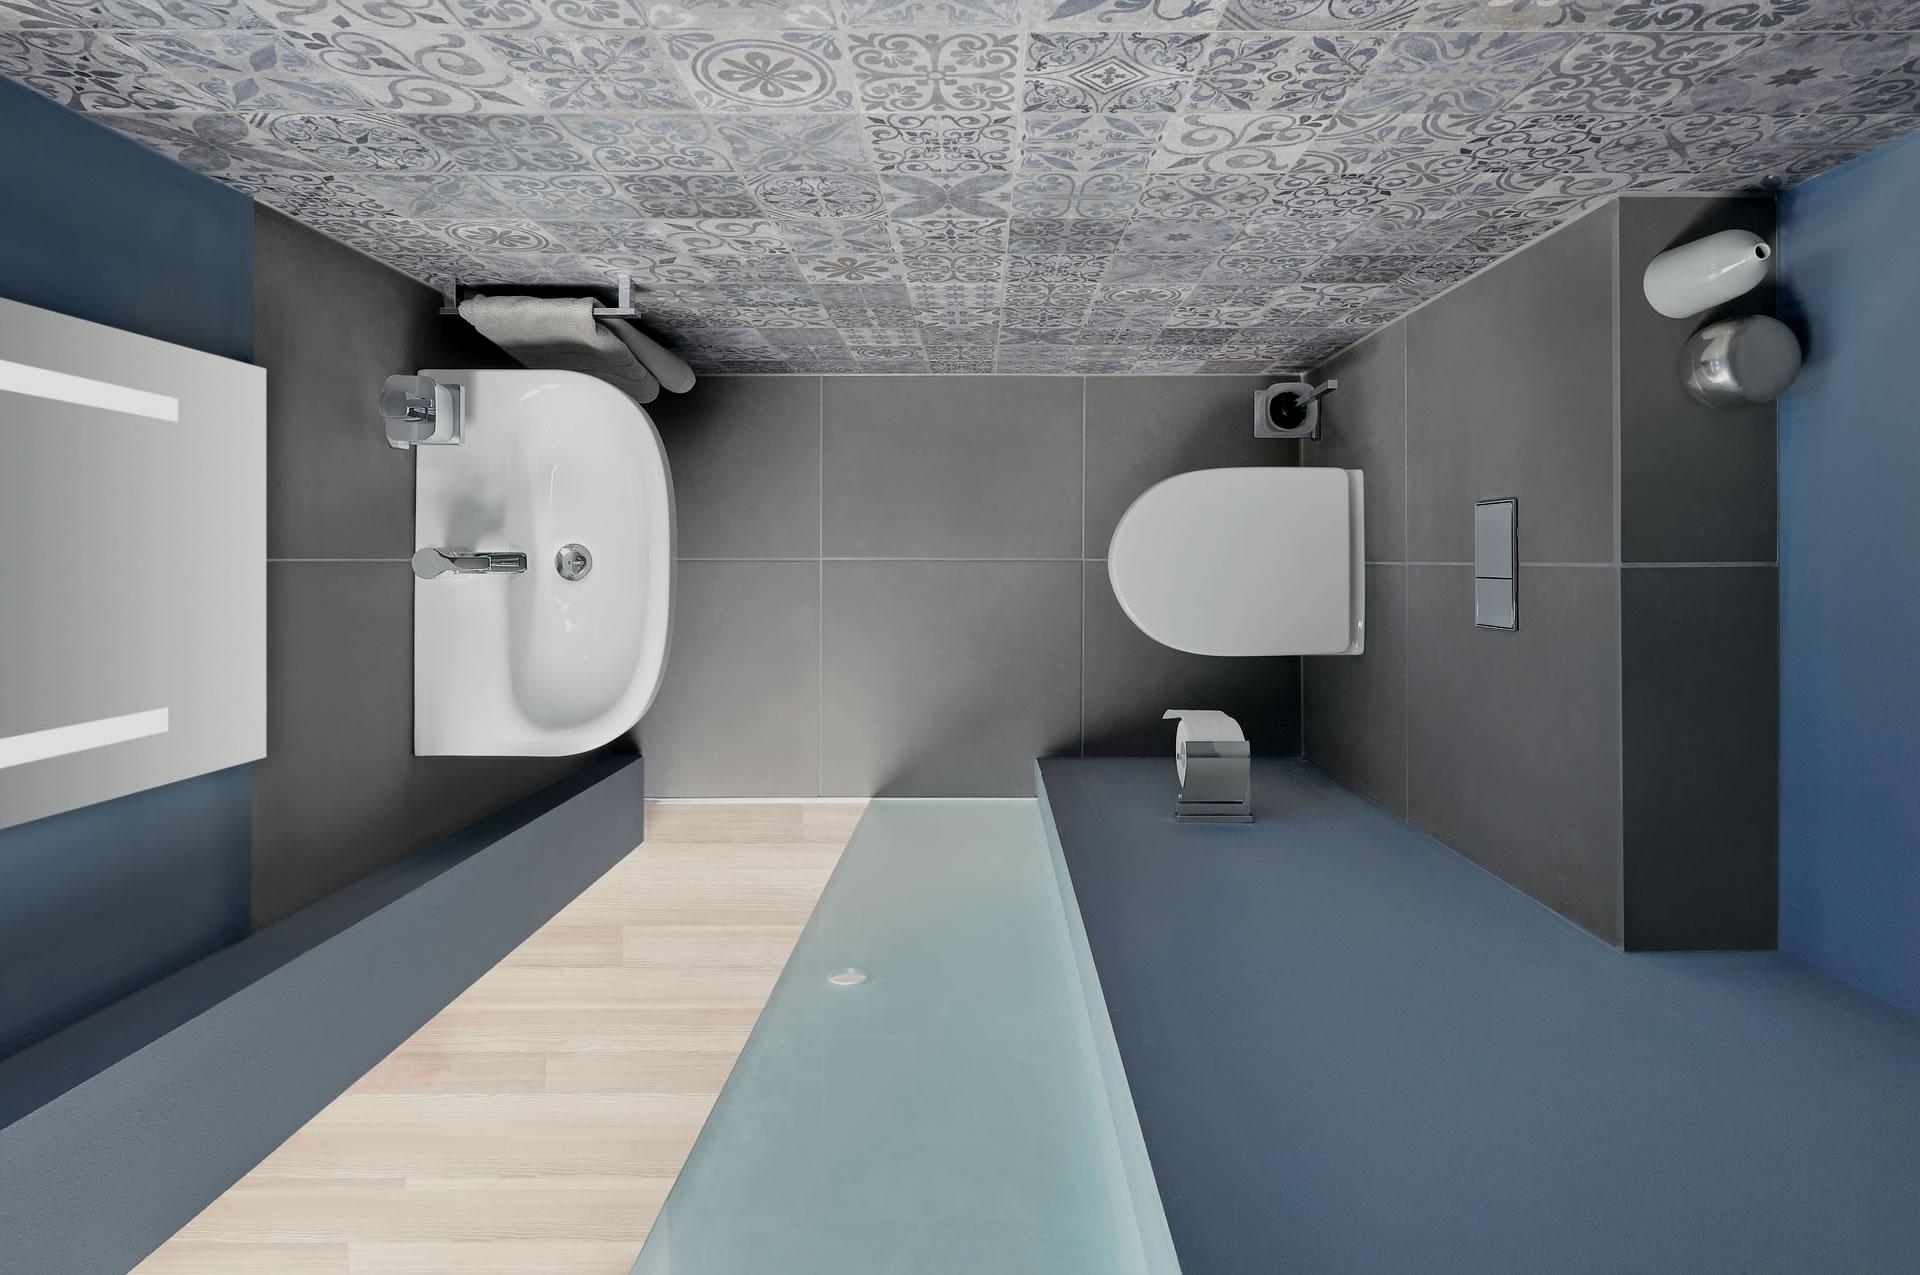 johann nickel haustechnik werlte heizung sanit r l ftung elektrotechnik. Black Bedroom Furniture Sets. Home Design Ideas